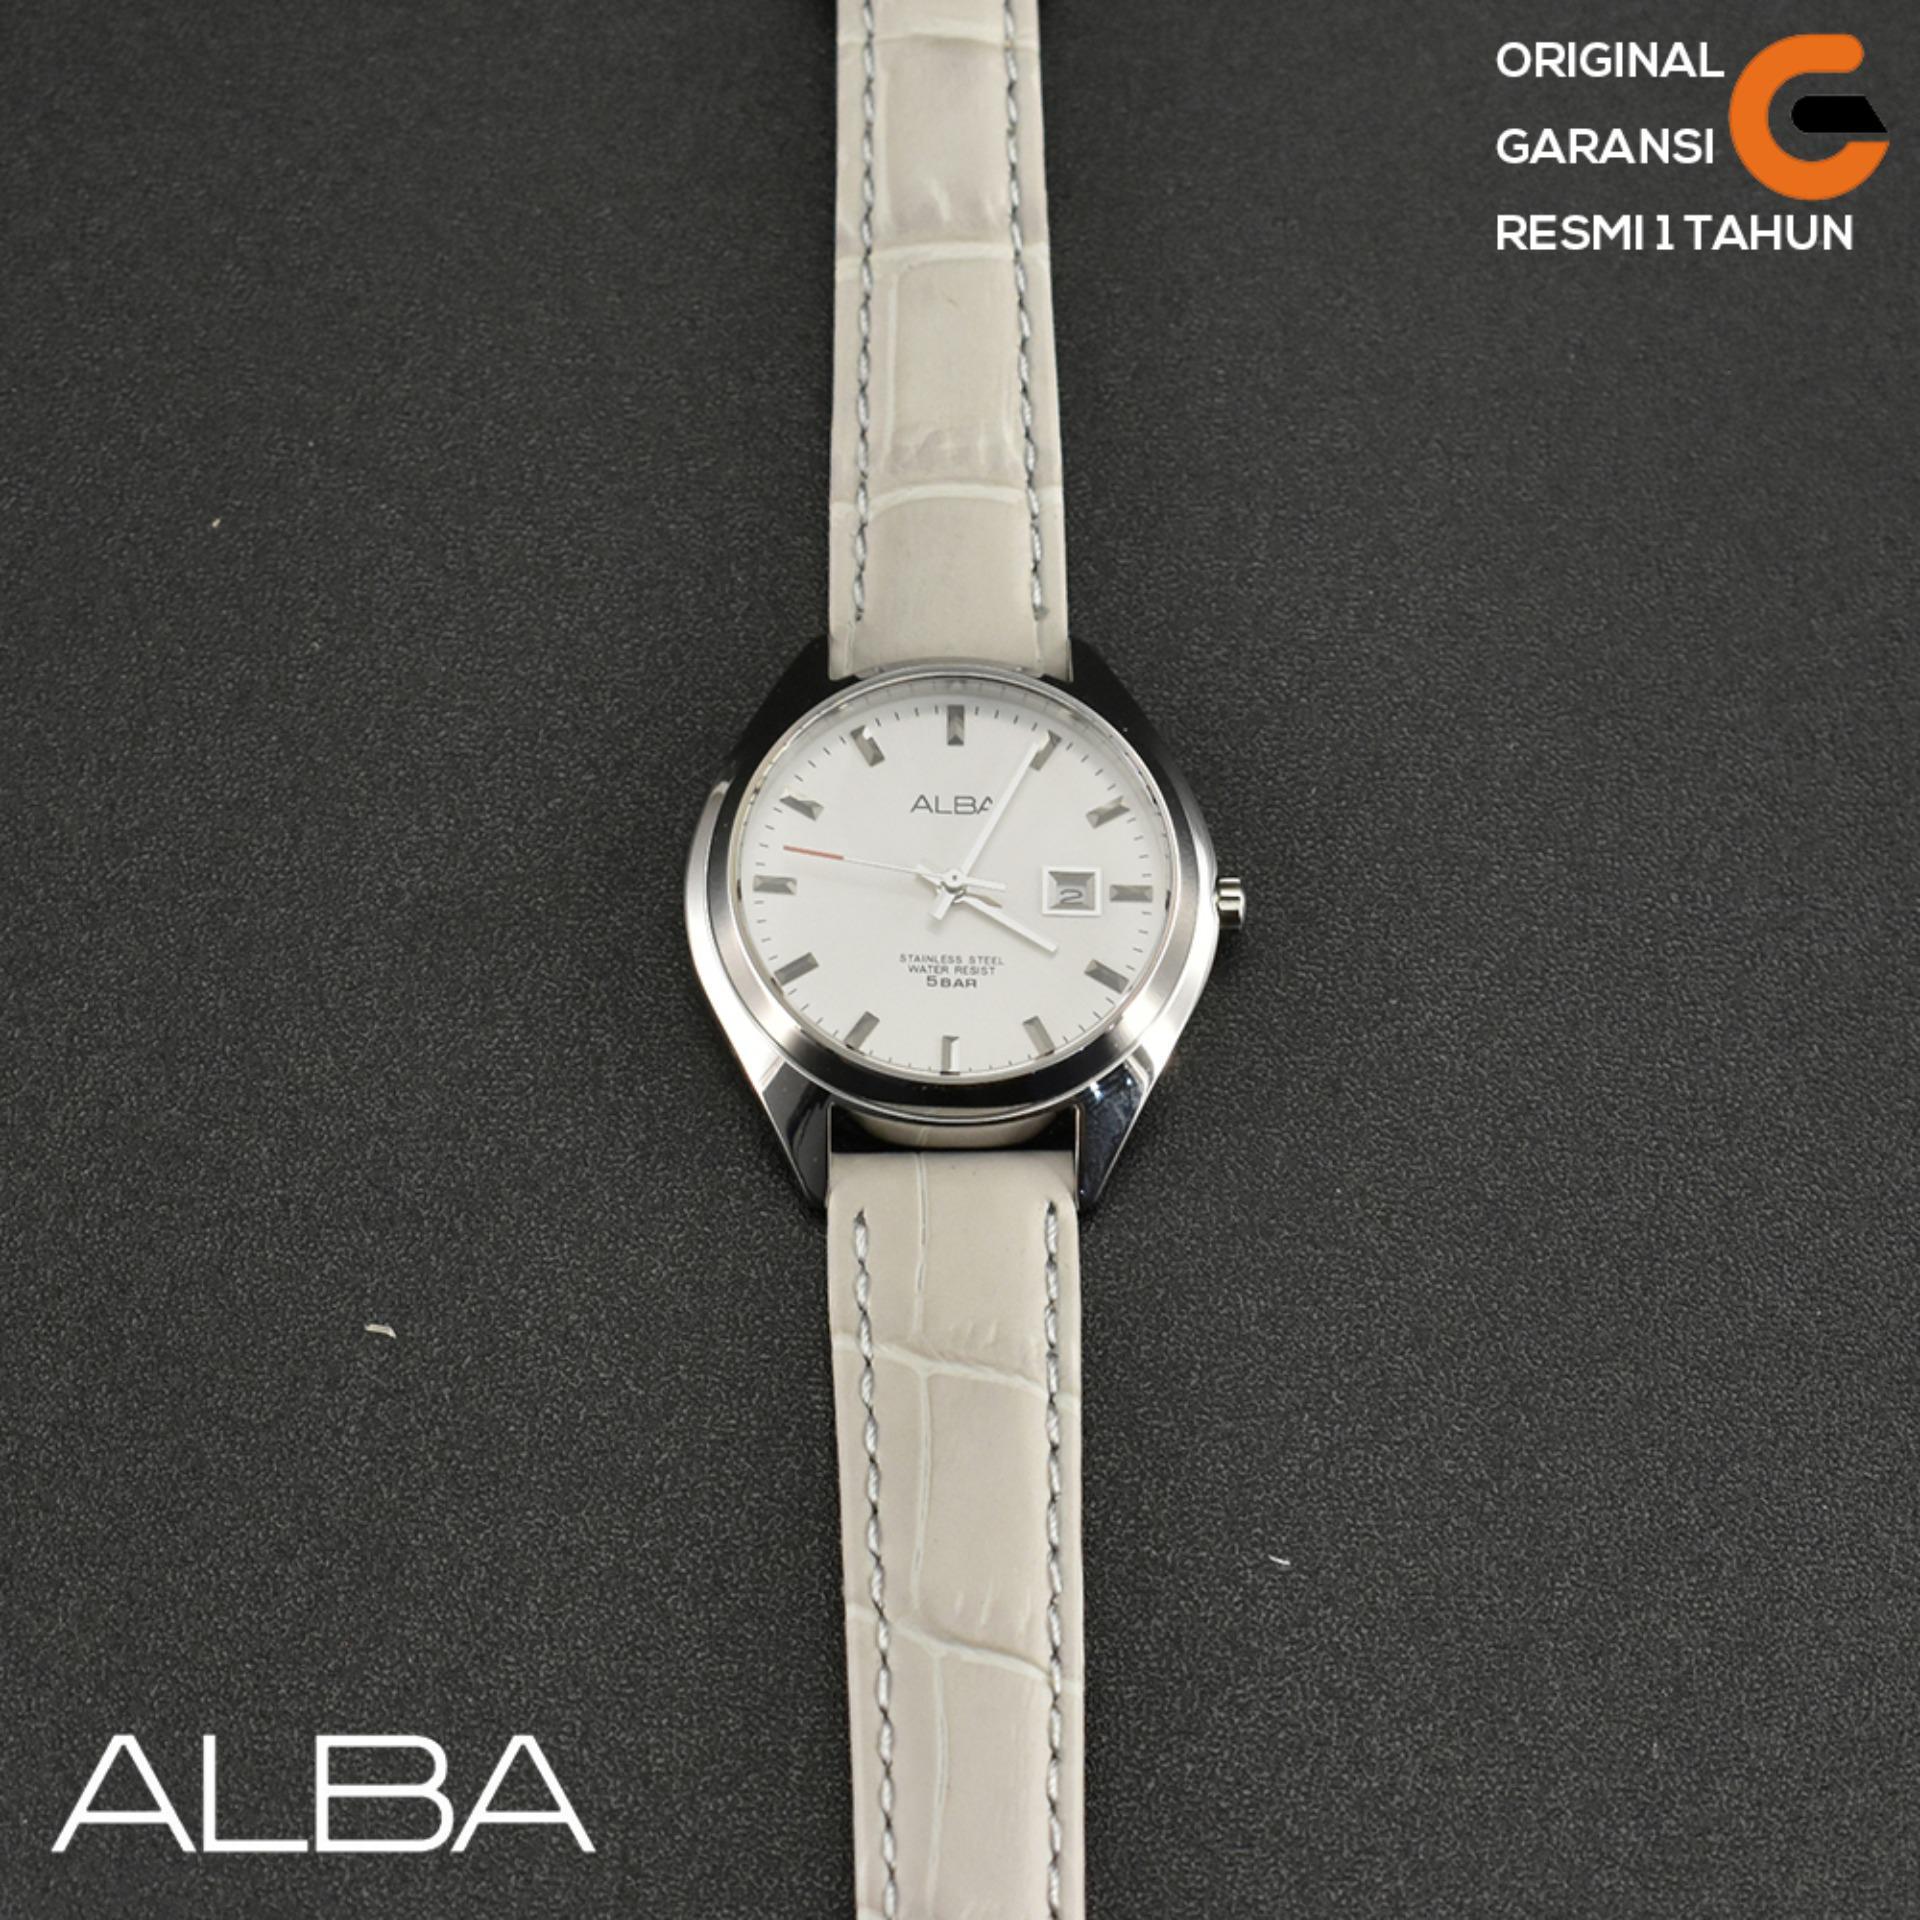 Alba Jam Tangan Wanita ALBA AH7Q17X1 Tali Tulit Leather Case Stainless Steel Jam tangan Alba Wanita